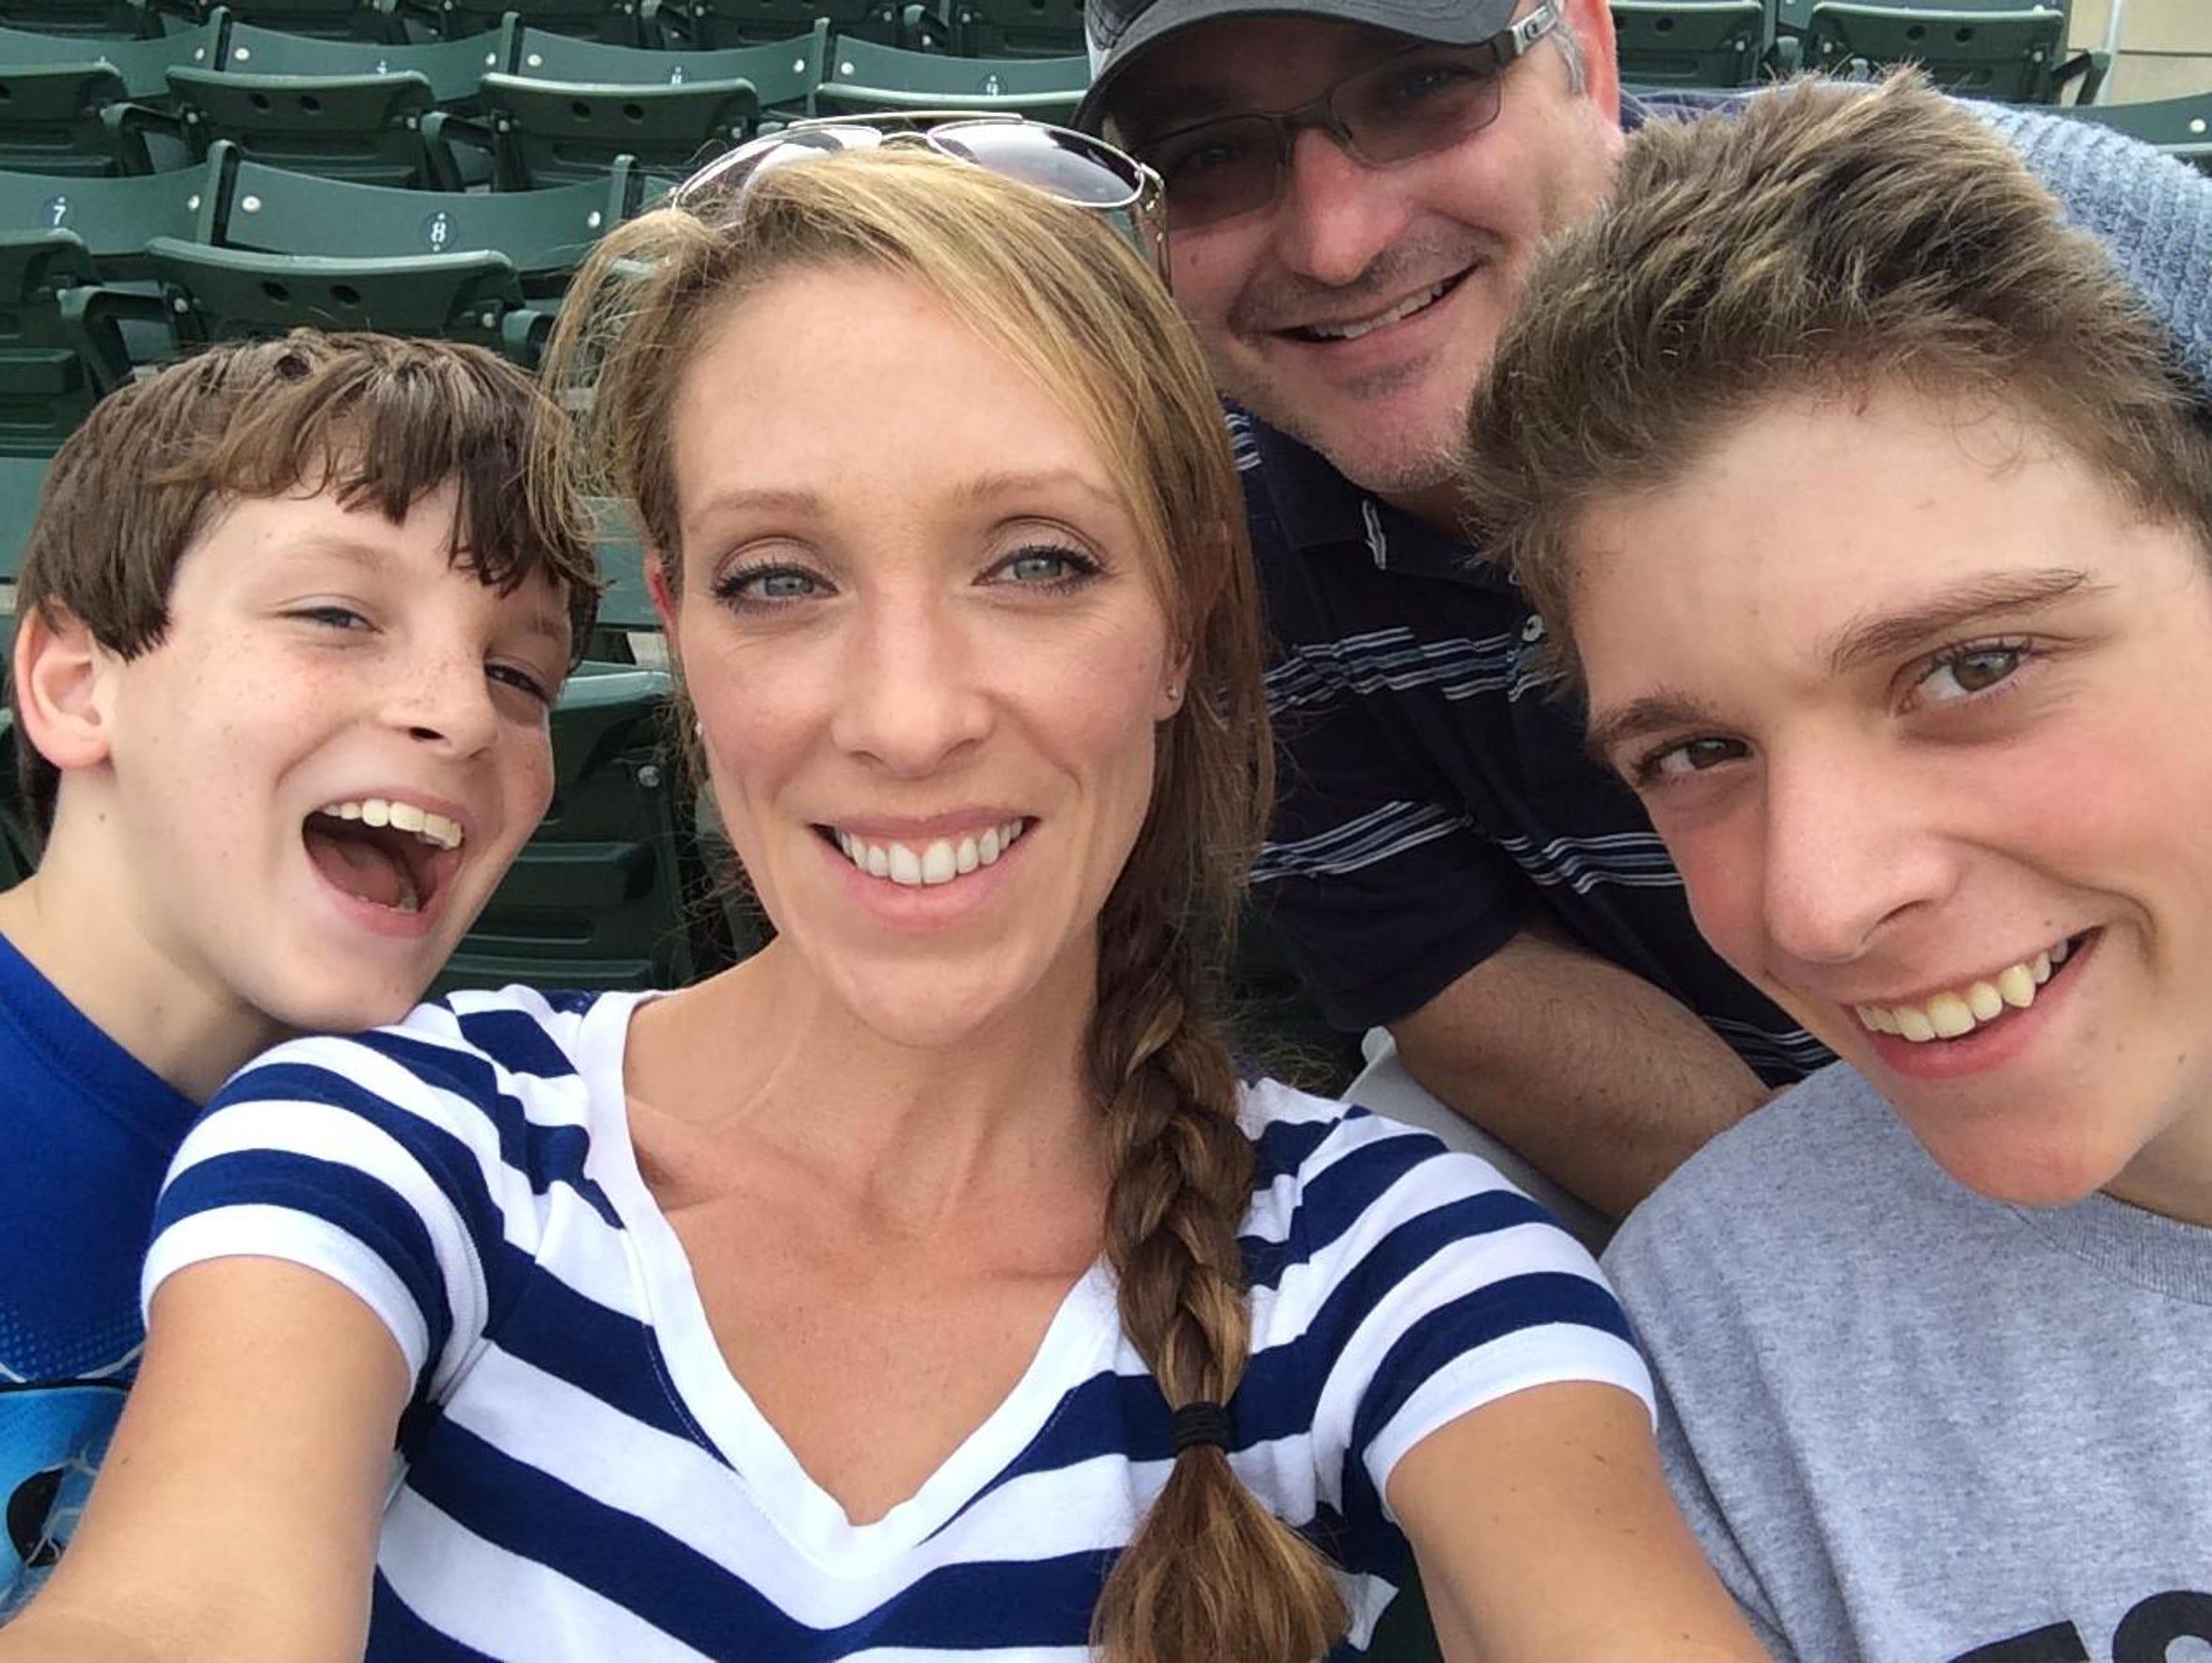 Austin Dukette, right, in a family photo.